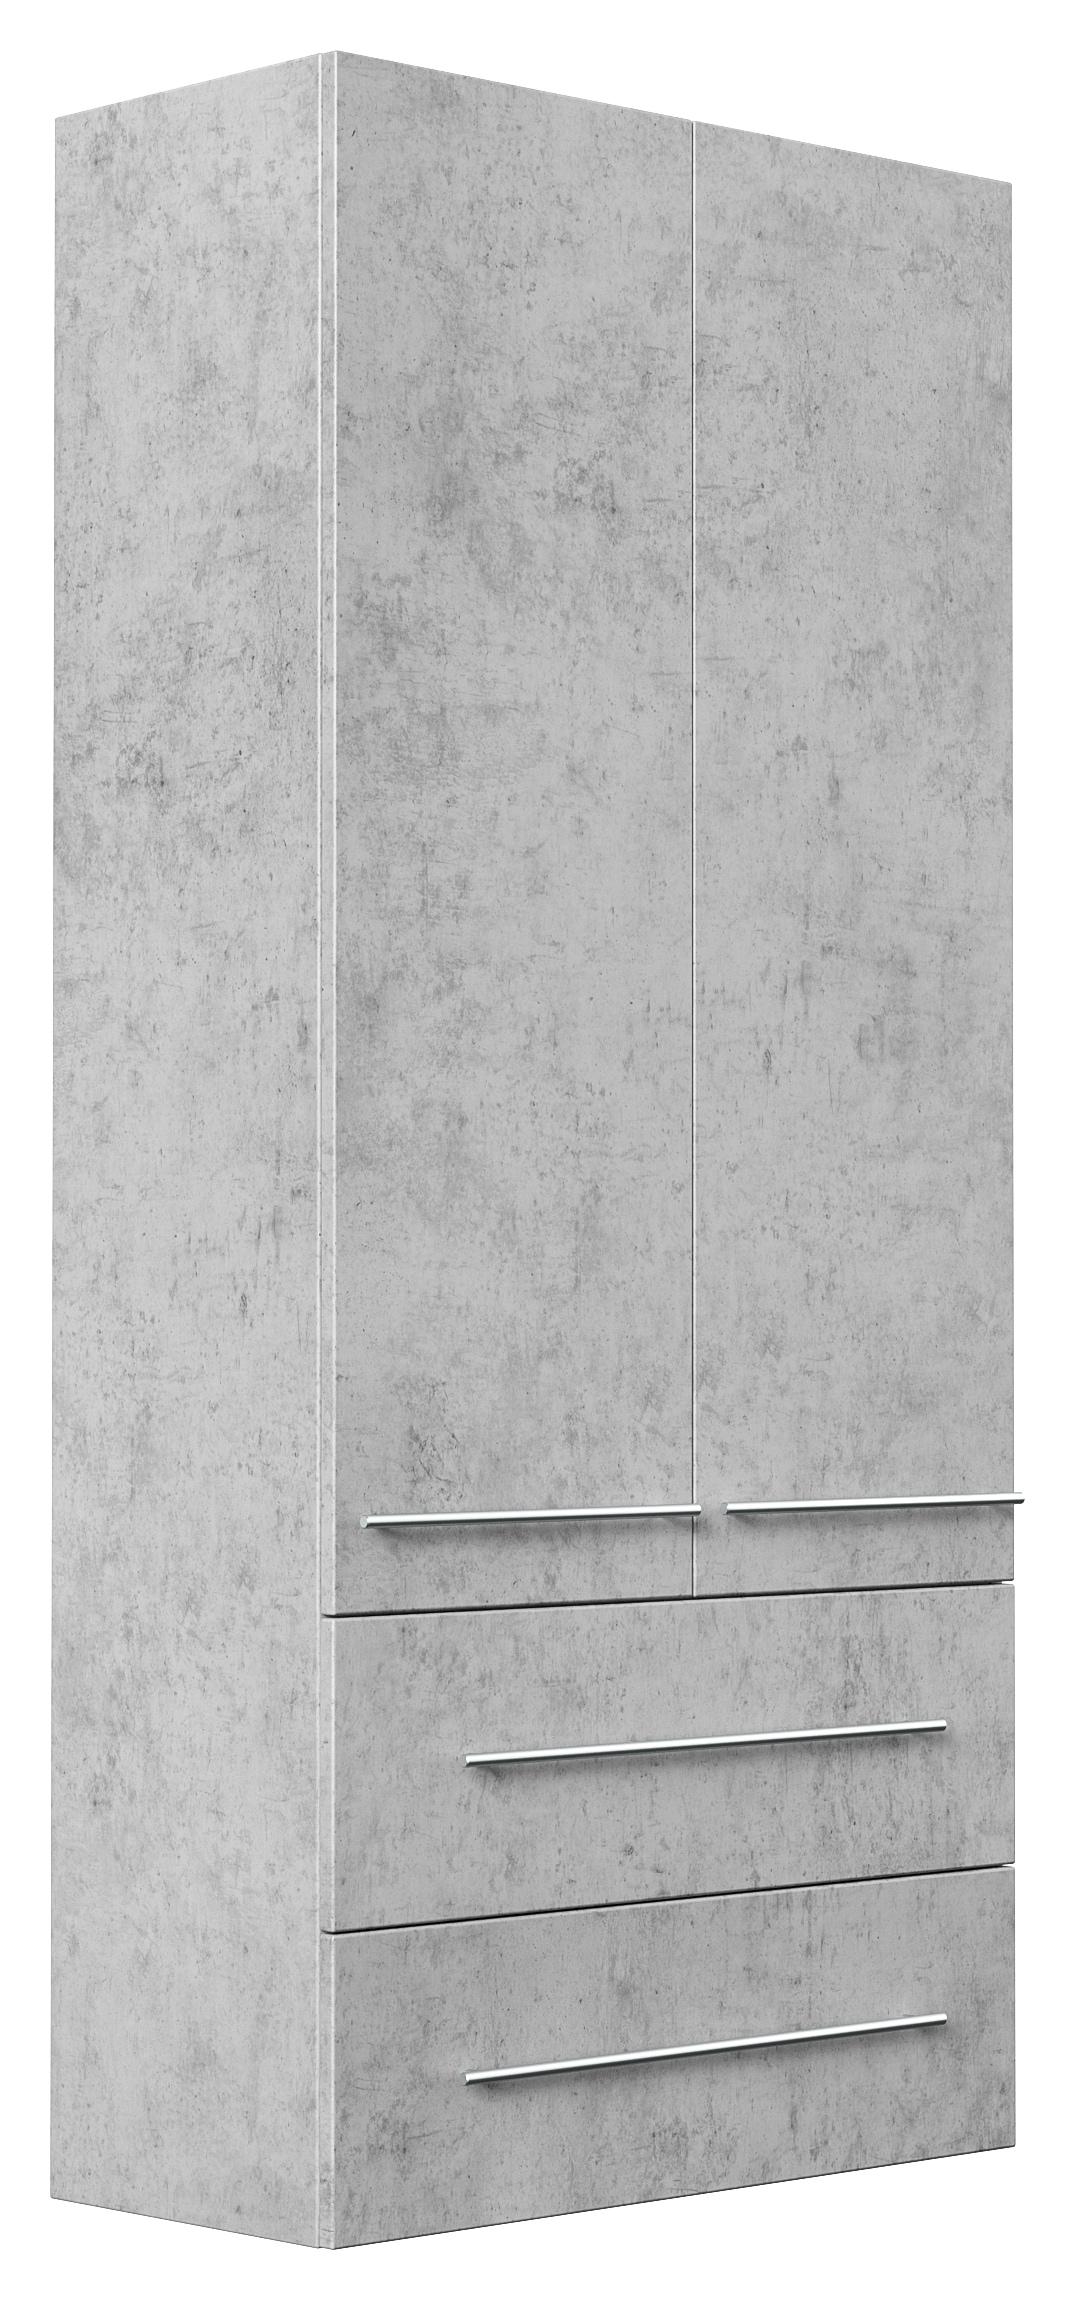 Saniclear Huge Kolomkast beton 80x176